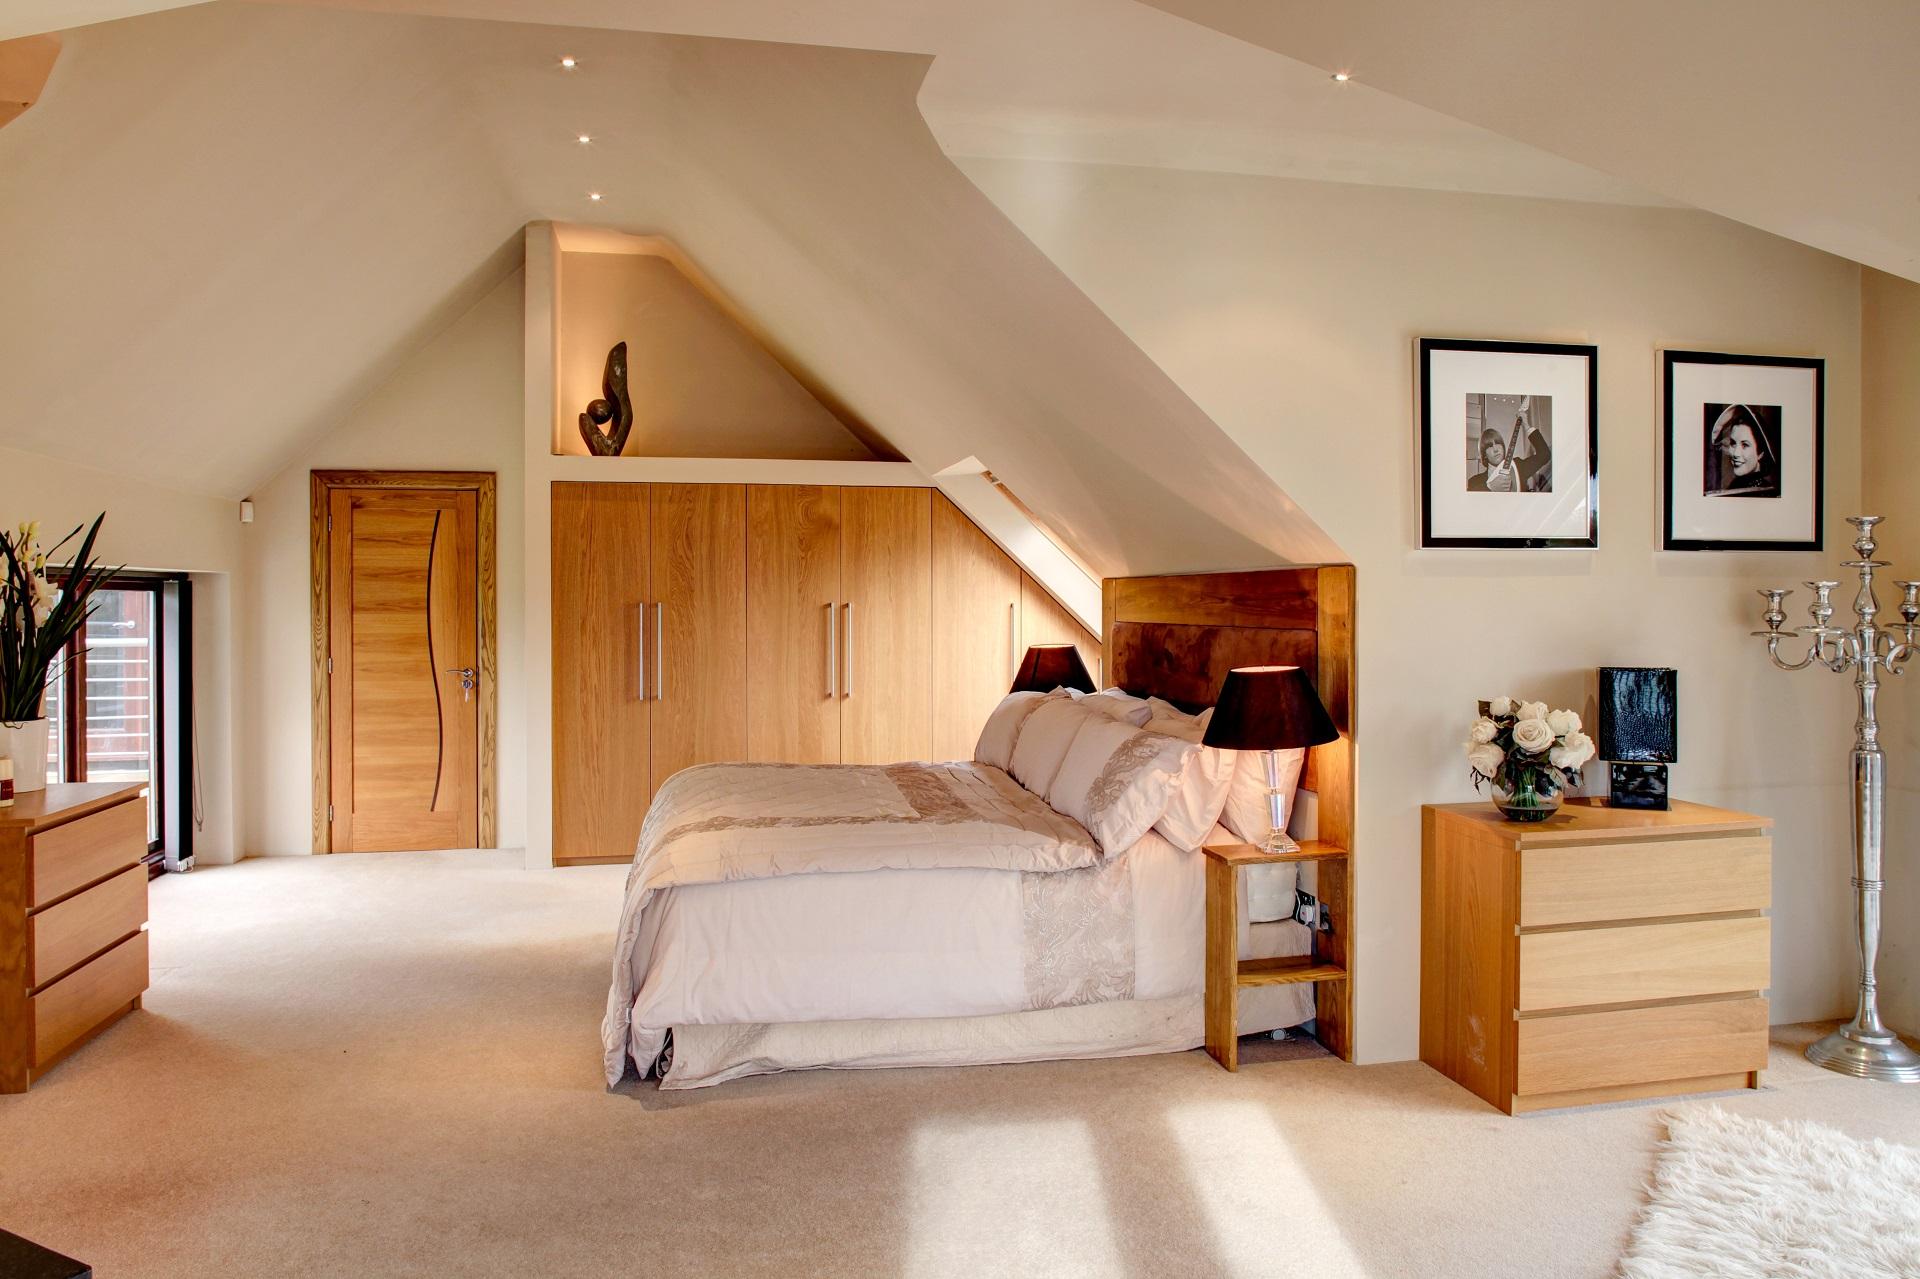 designer bedroom, interior design, nottingham, fern hill